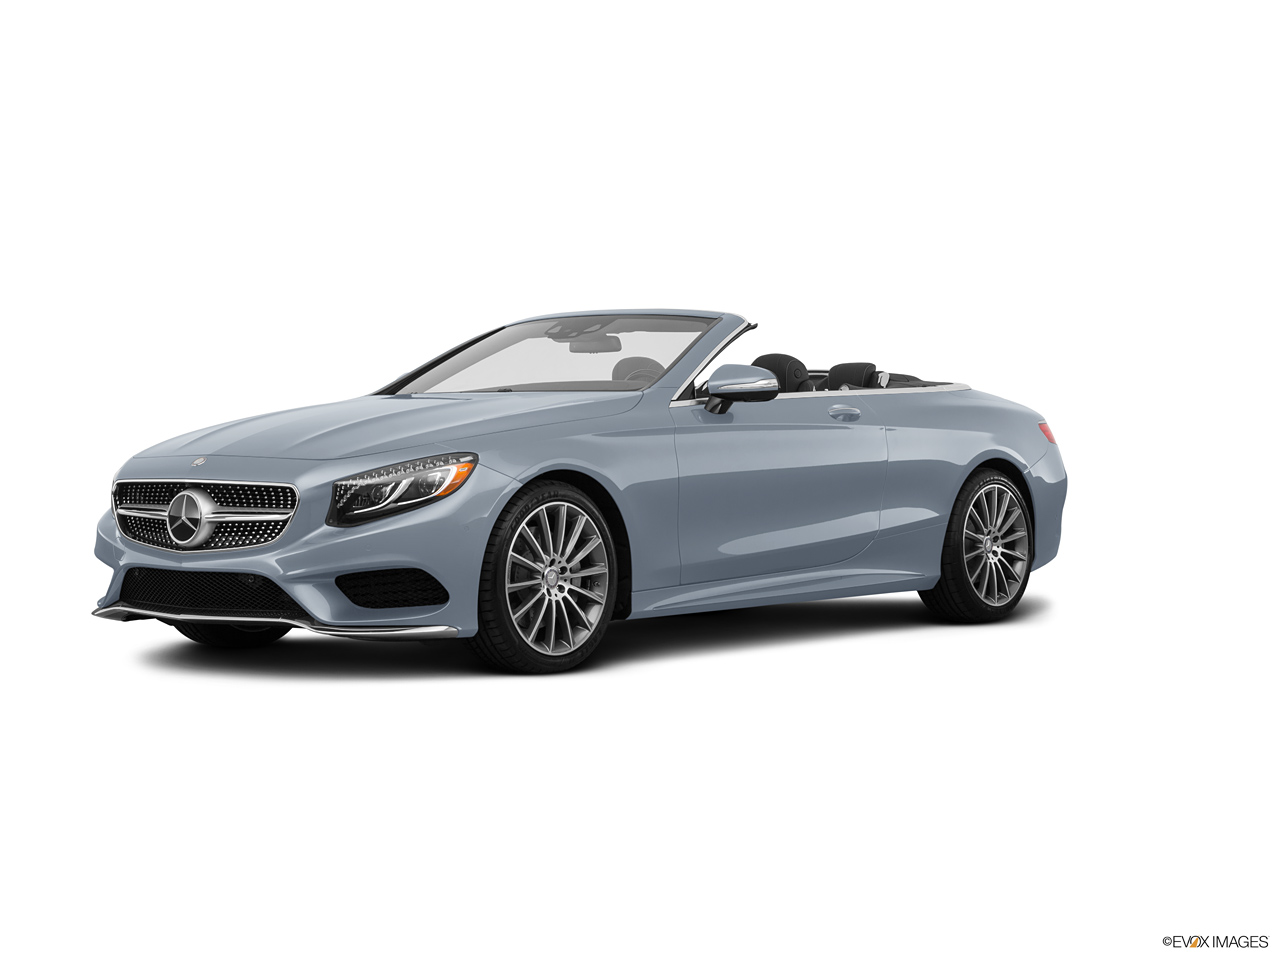 Car pictures list for mercedes benz s class cabriolet 2018 for Mercedes benz payment estimator